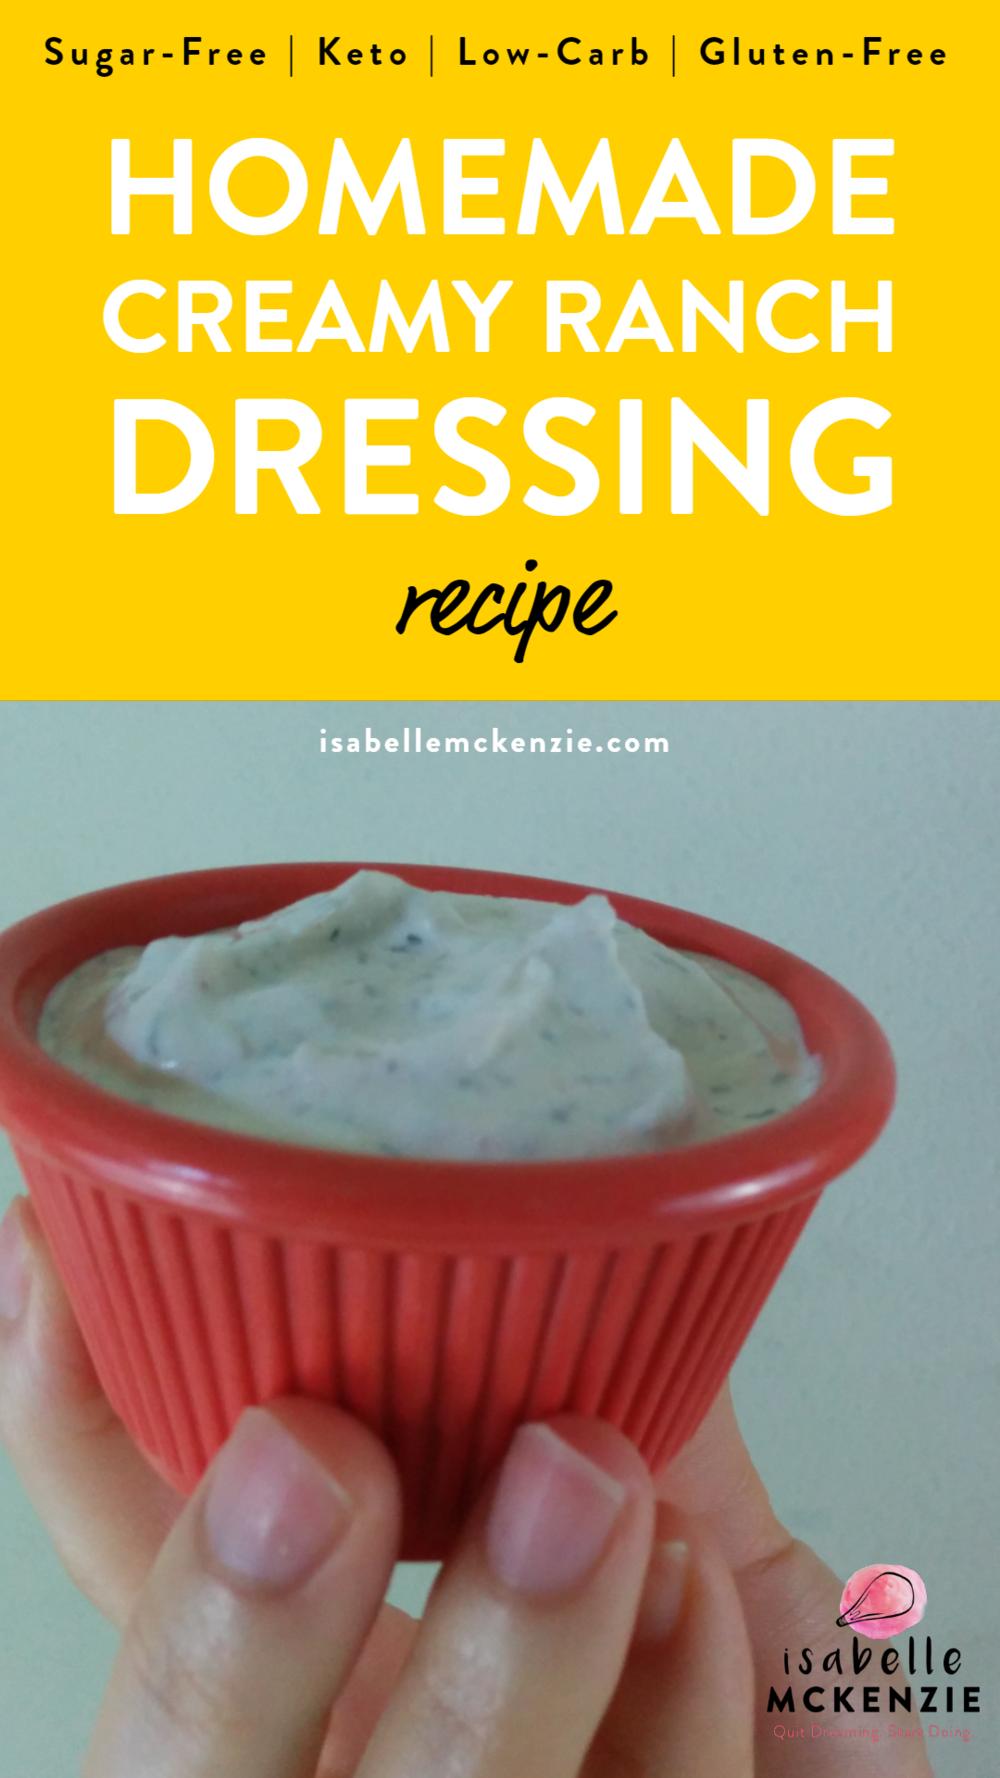 Creamy Homemade Sugar-Free Ranch Dressing (Gluten-Free, Keto, Low Carb)